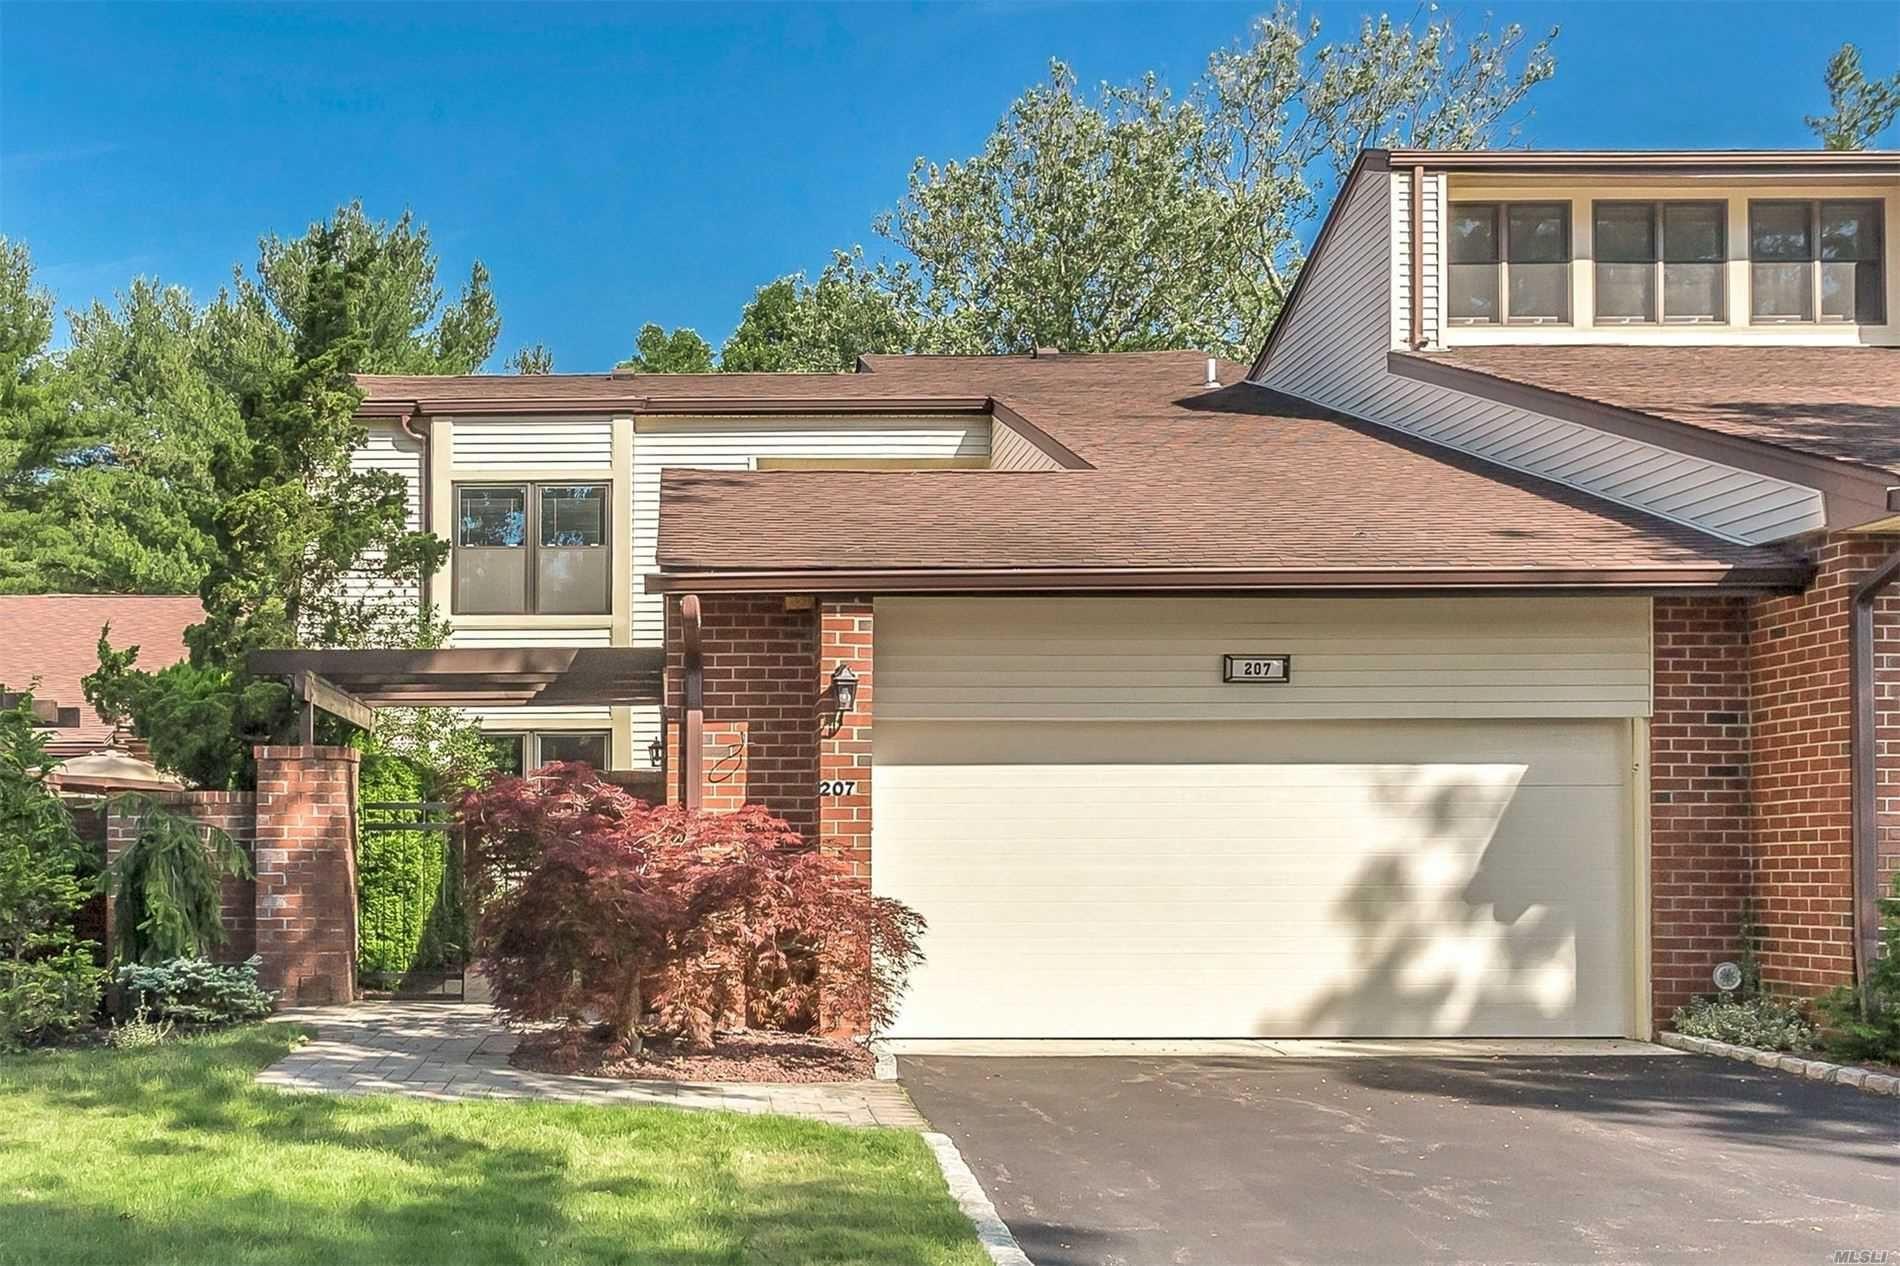 207 Gosling Hill Drive, Manhasset, NY 11030 - MLS#: 3227938